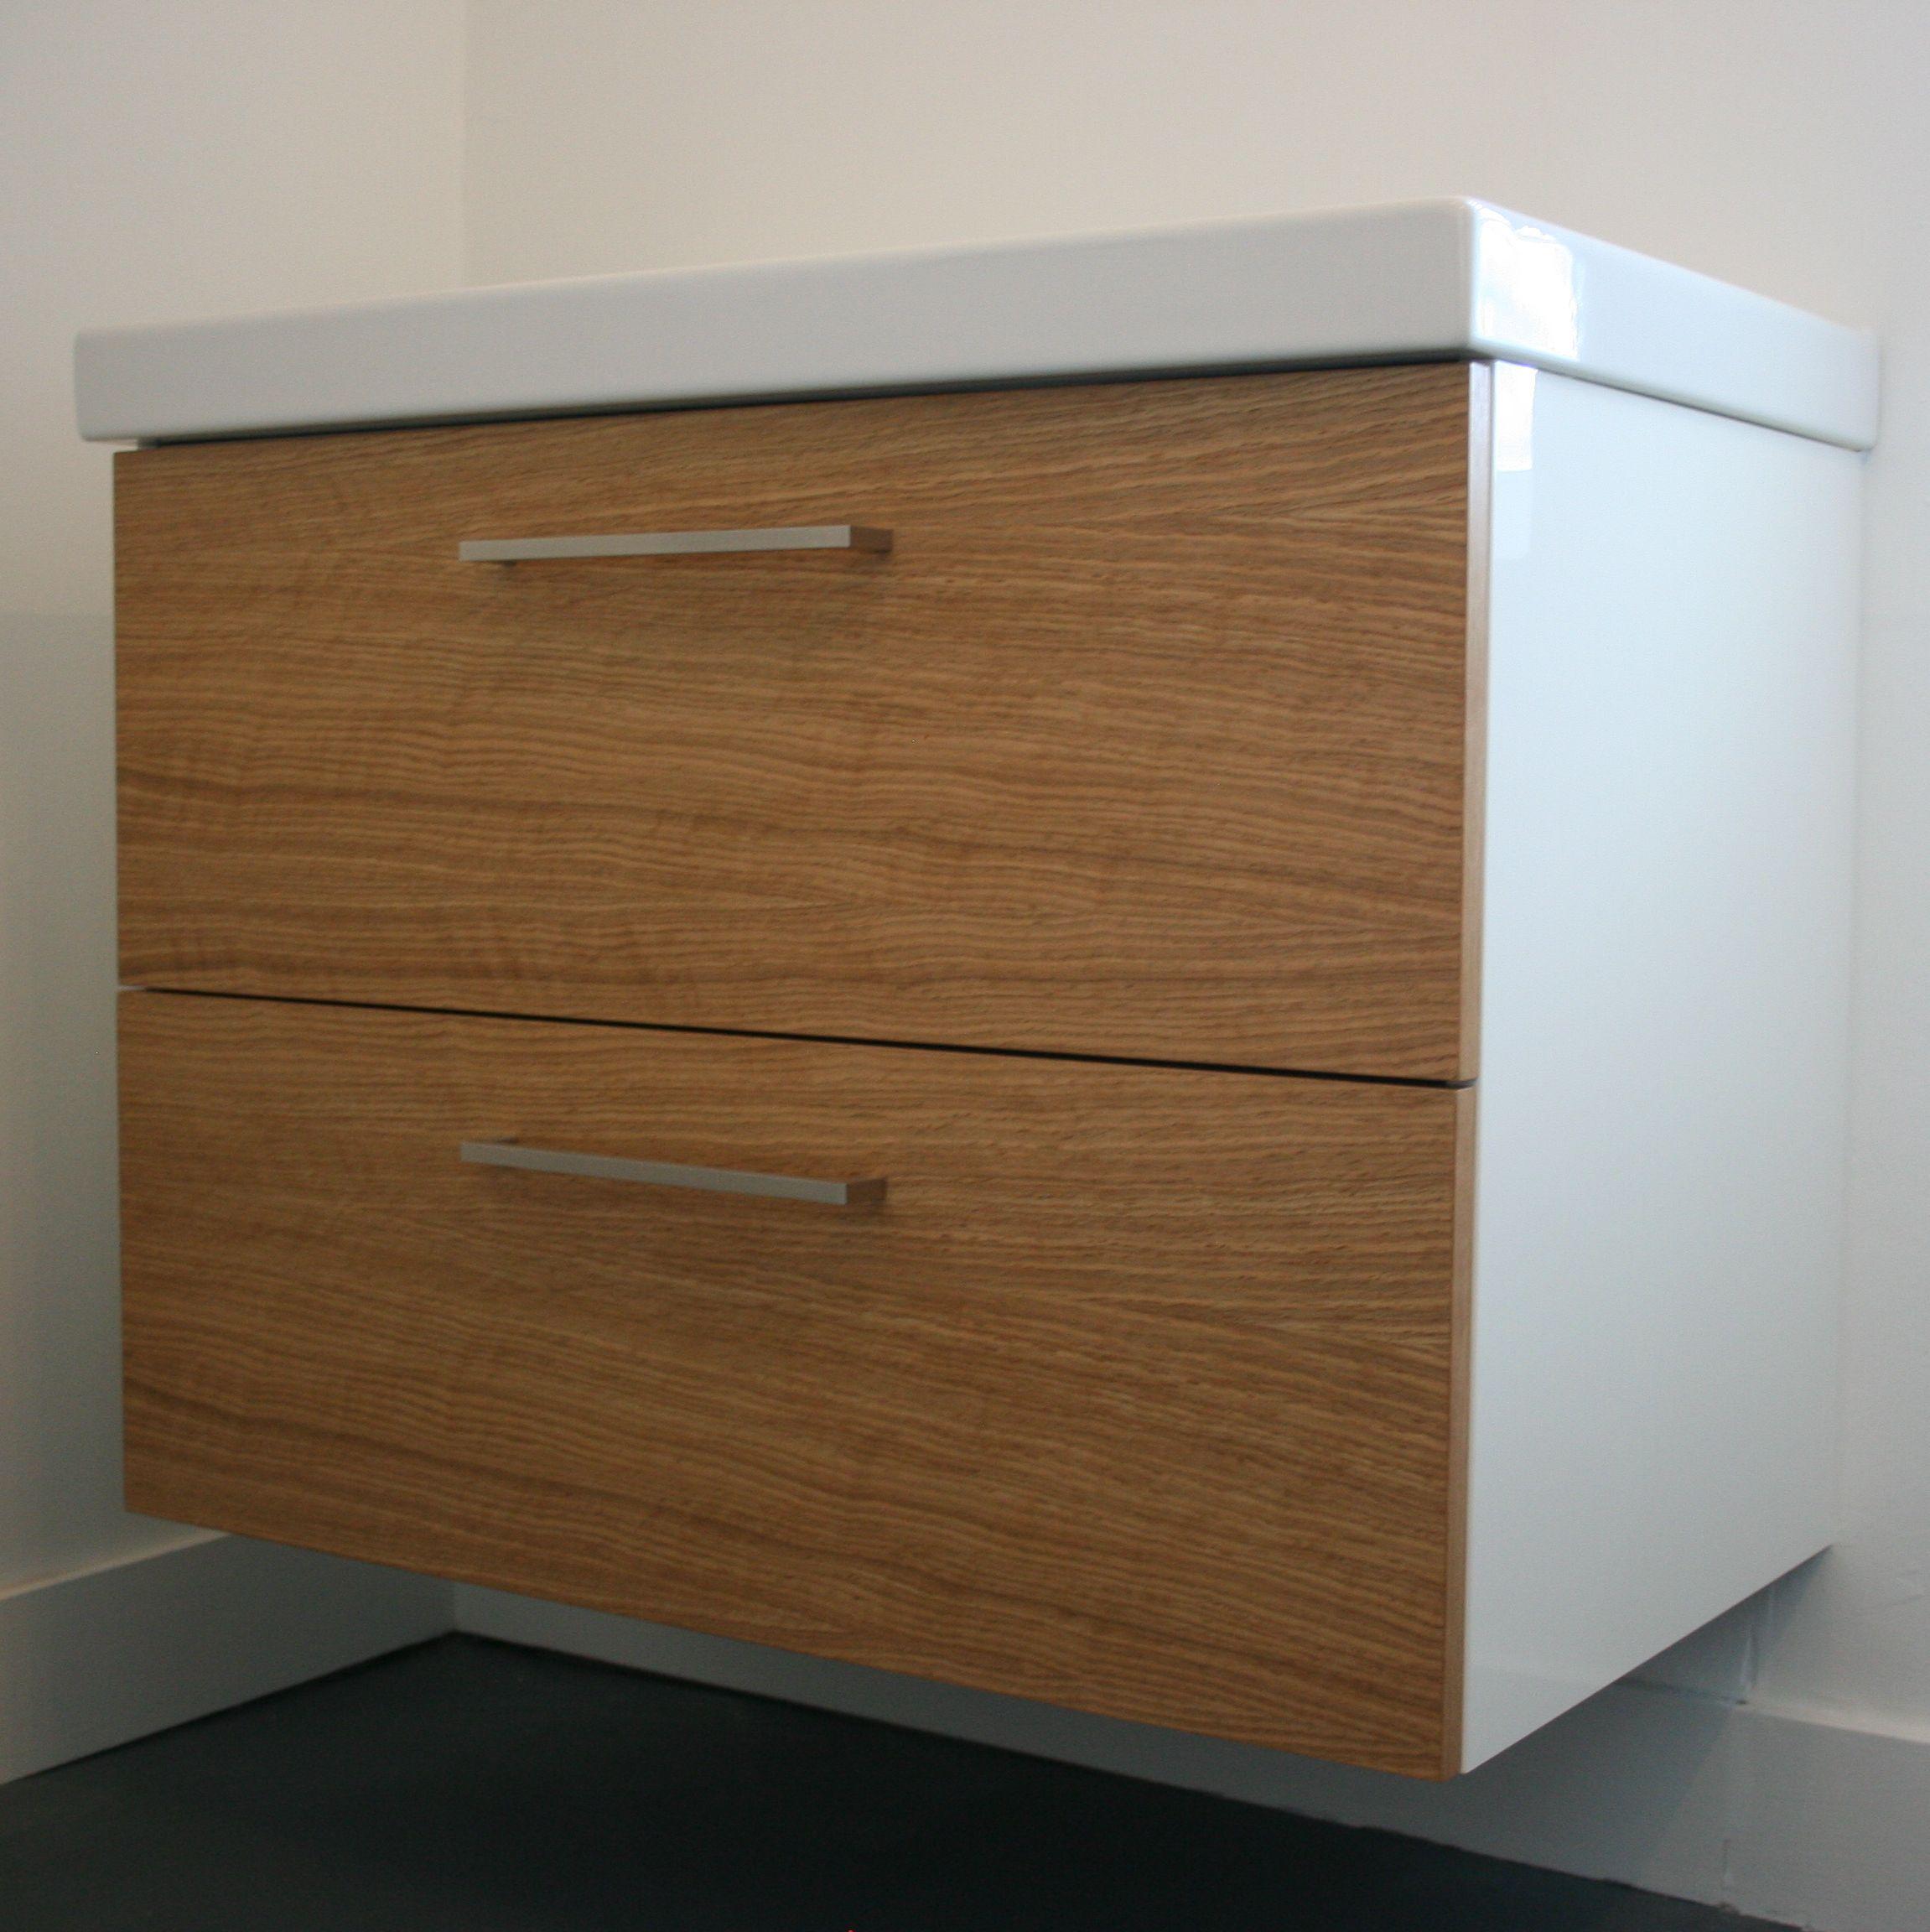 Ikea Kitchen Cabinets 2017: Semihandmade Oak IKEA™ Bathroom In Burbank, CA